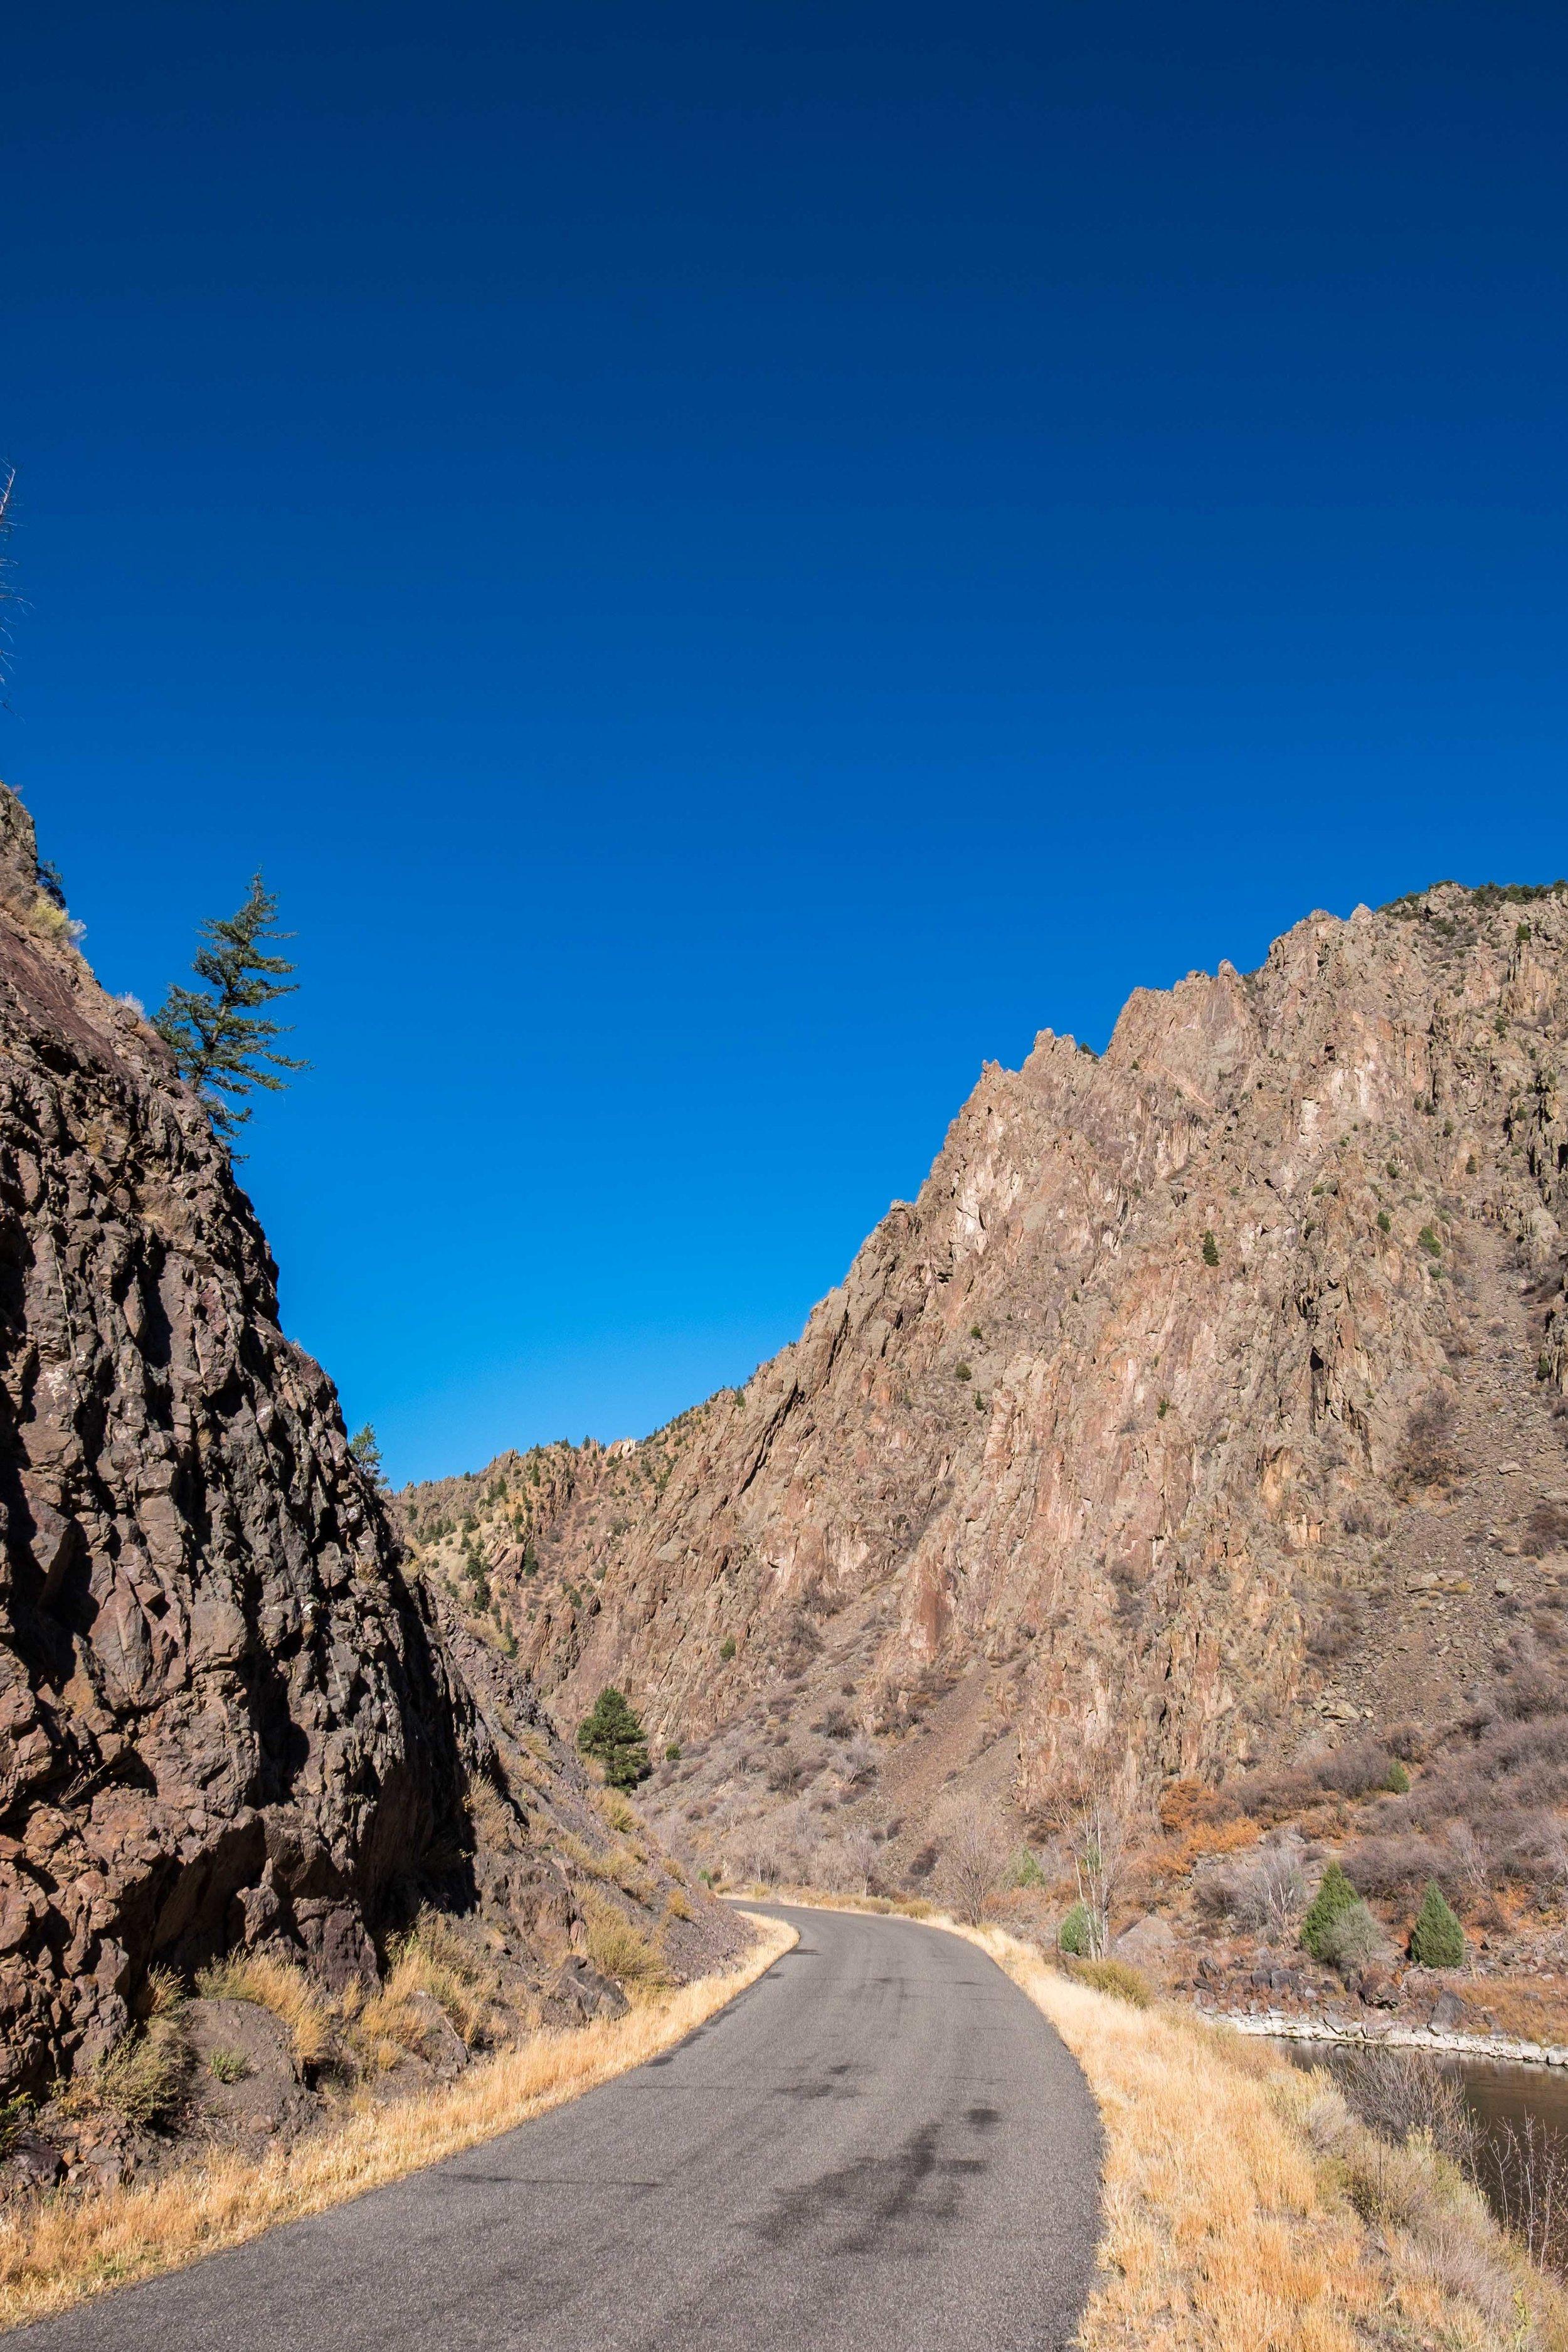 Black Canyon of the Gunnison National Park - 026.jpg